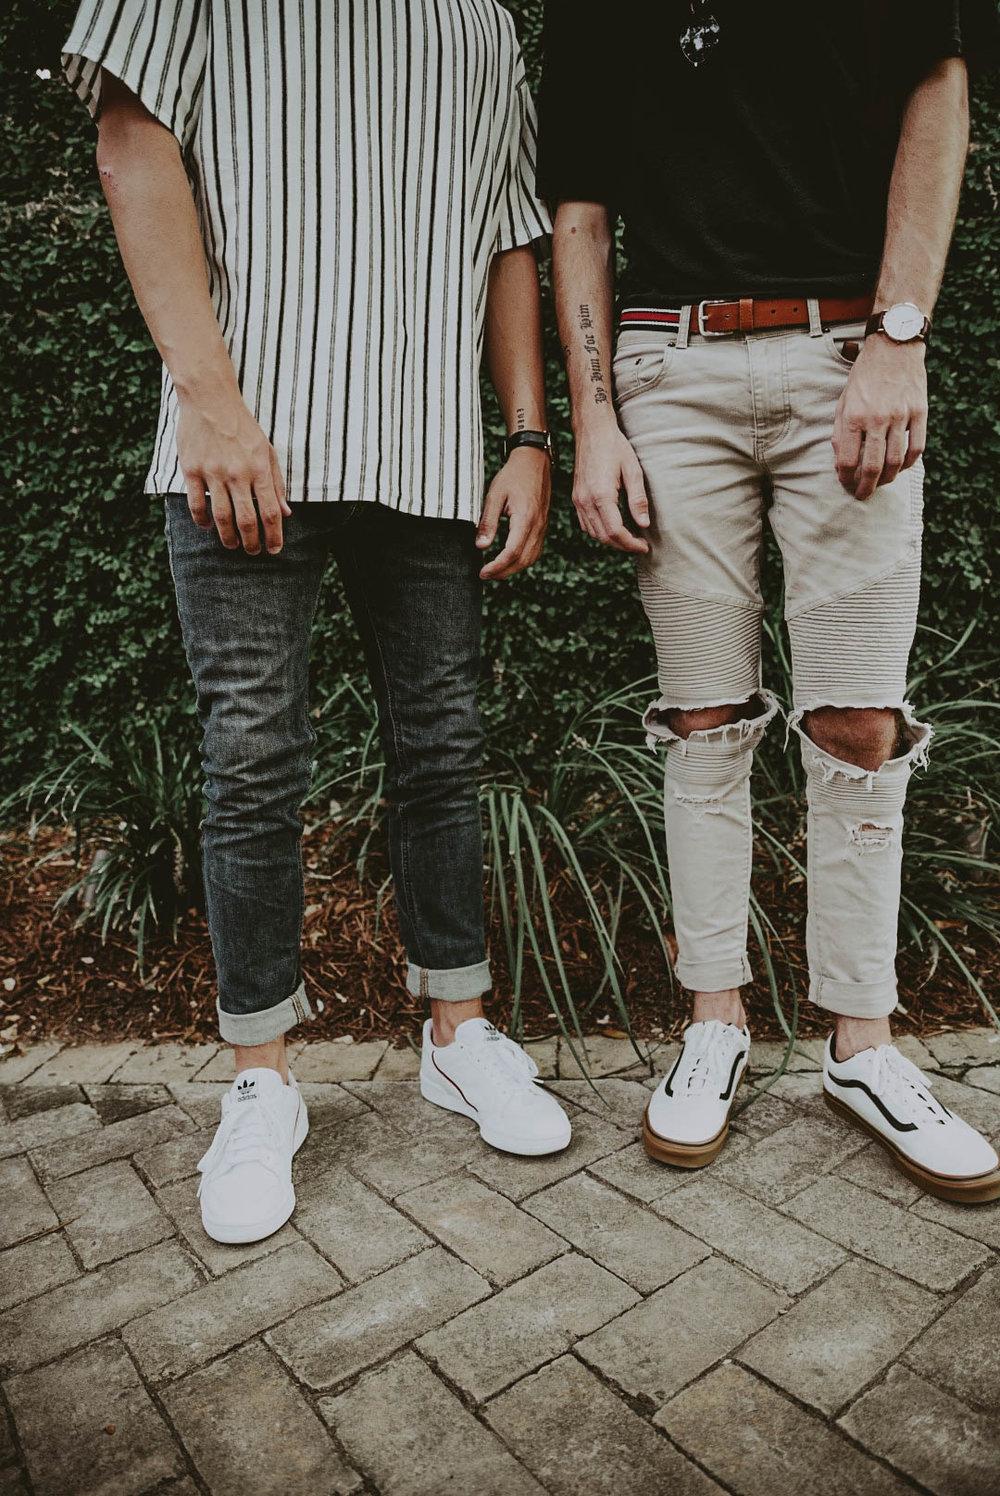 mens fashion blog on the rise?